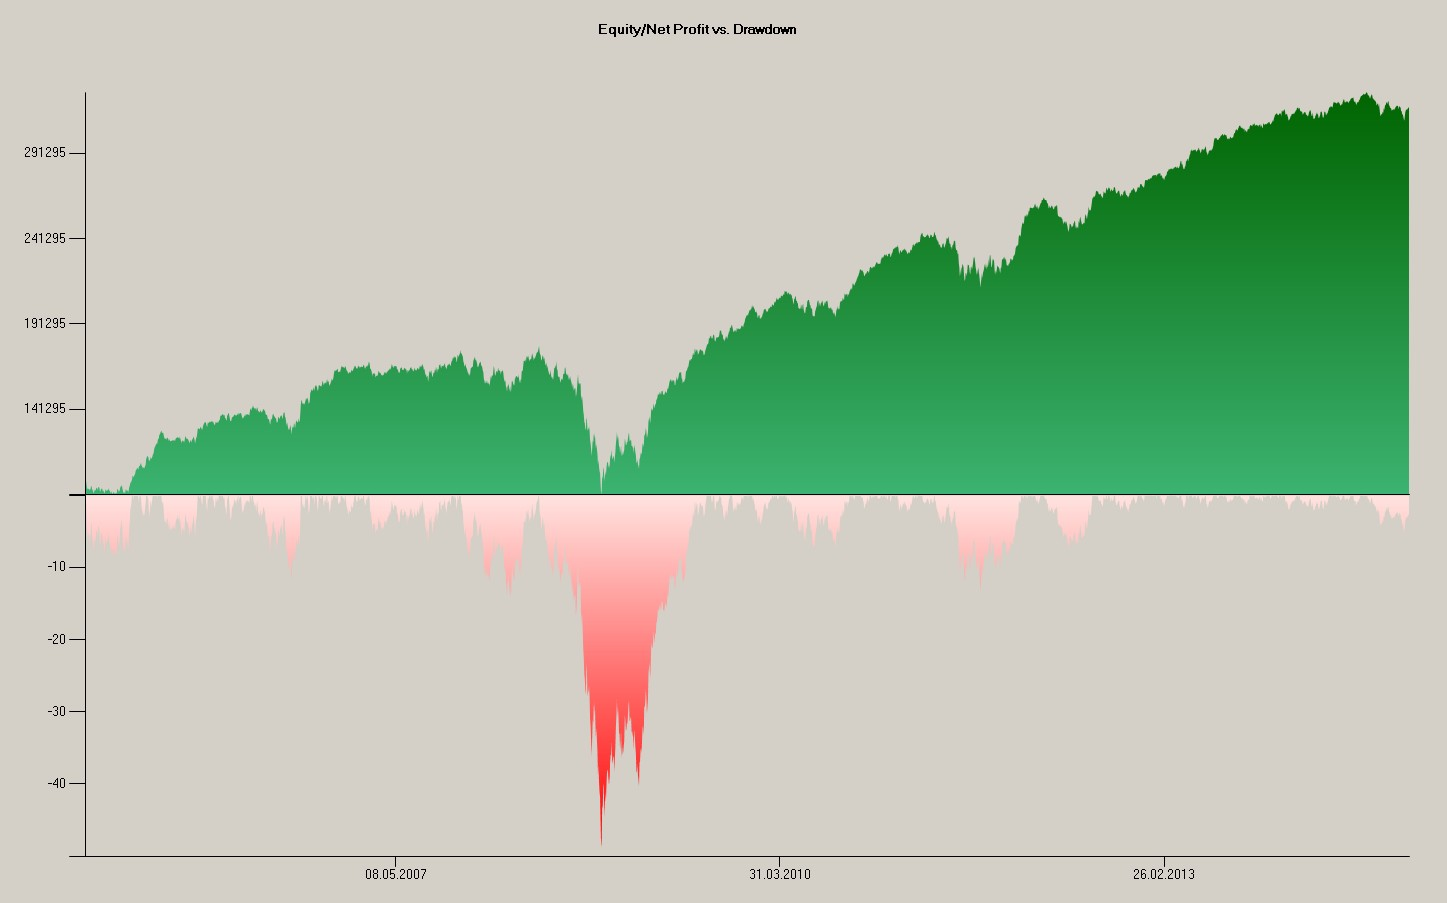 Equity-Weakest